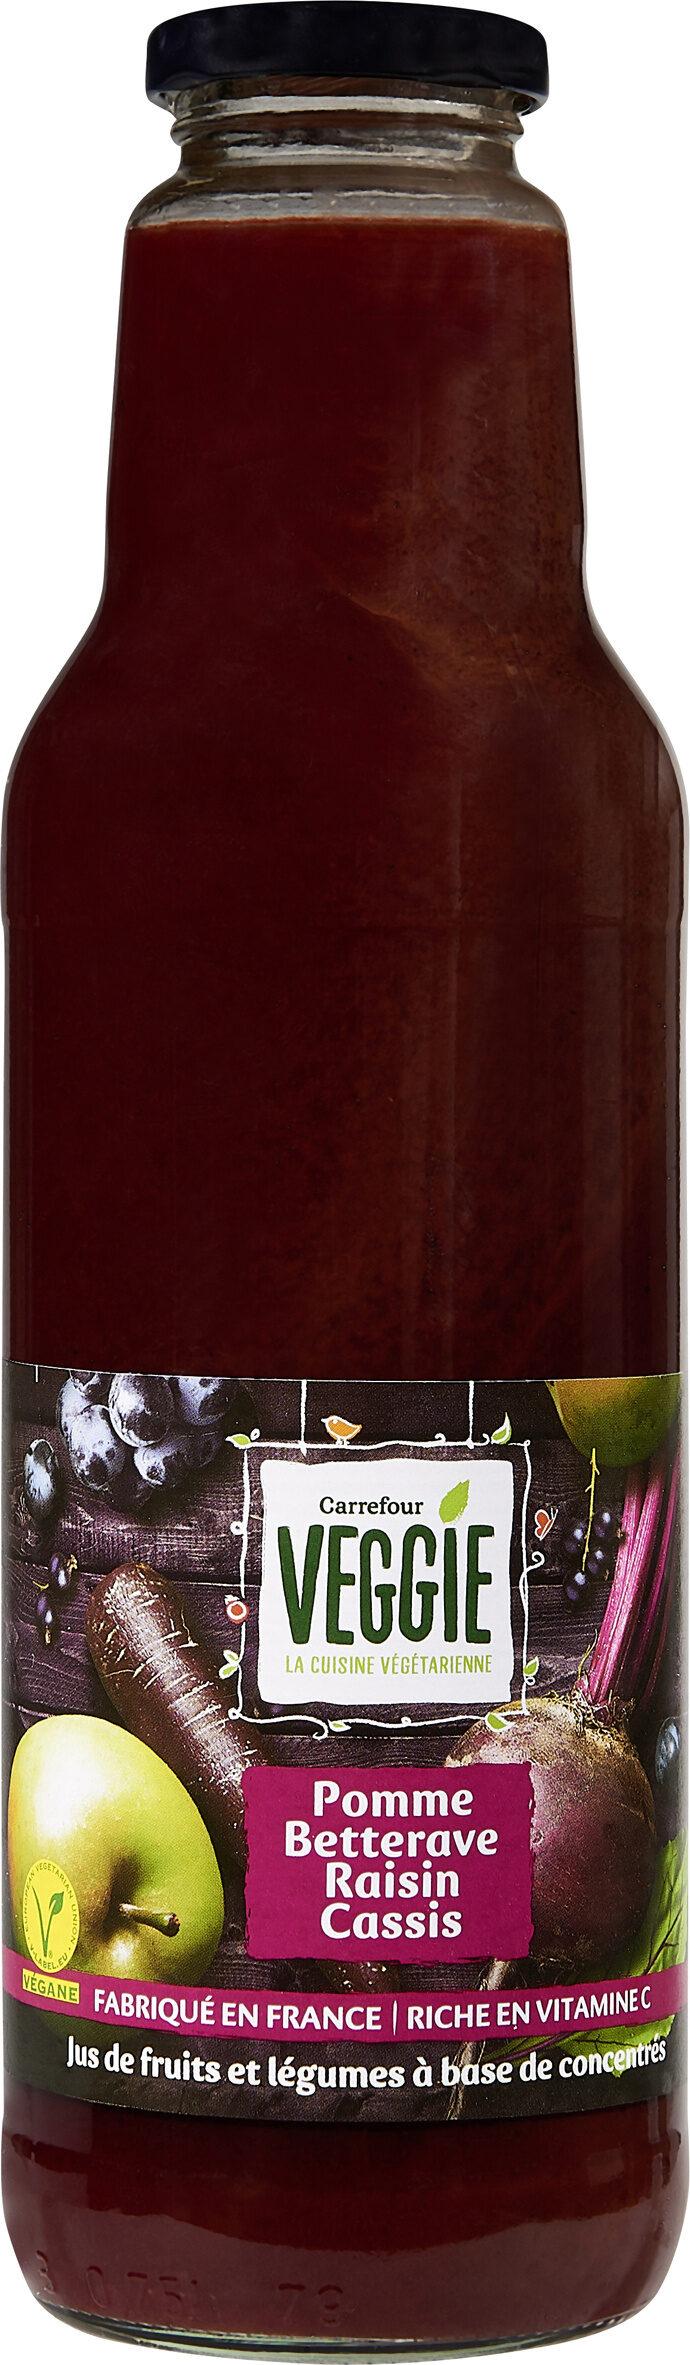 Pomme betterave raisin cassis - Prodotto - fr